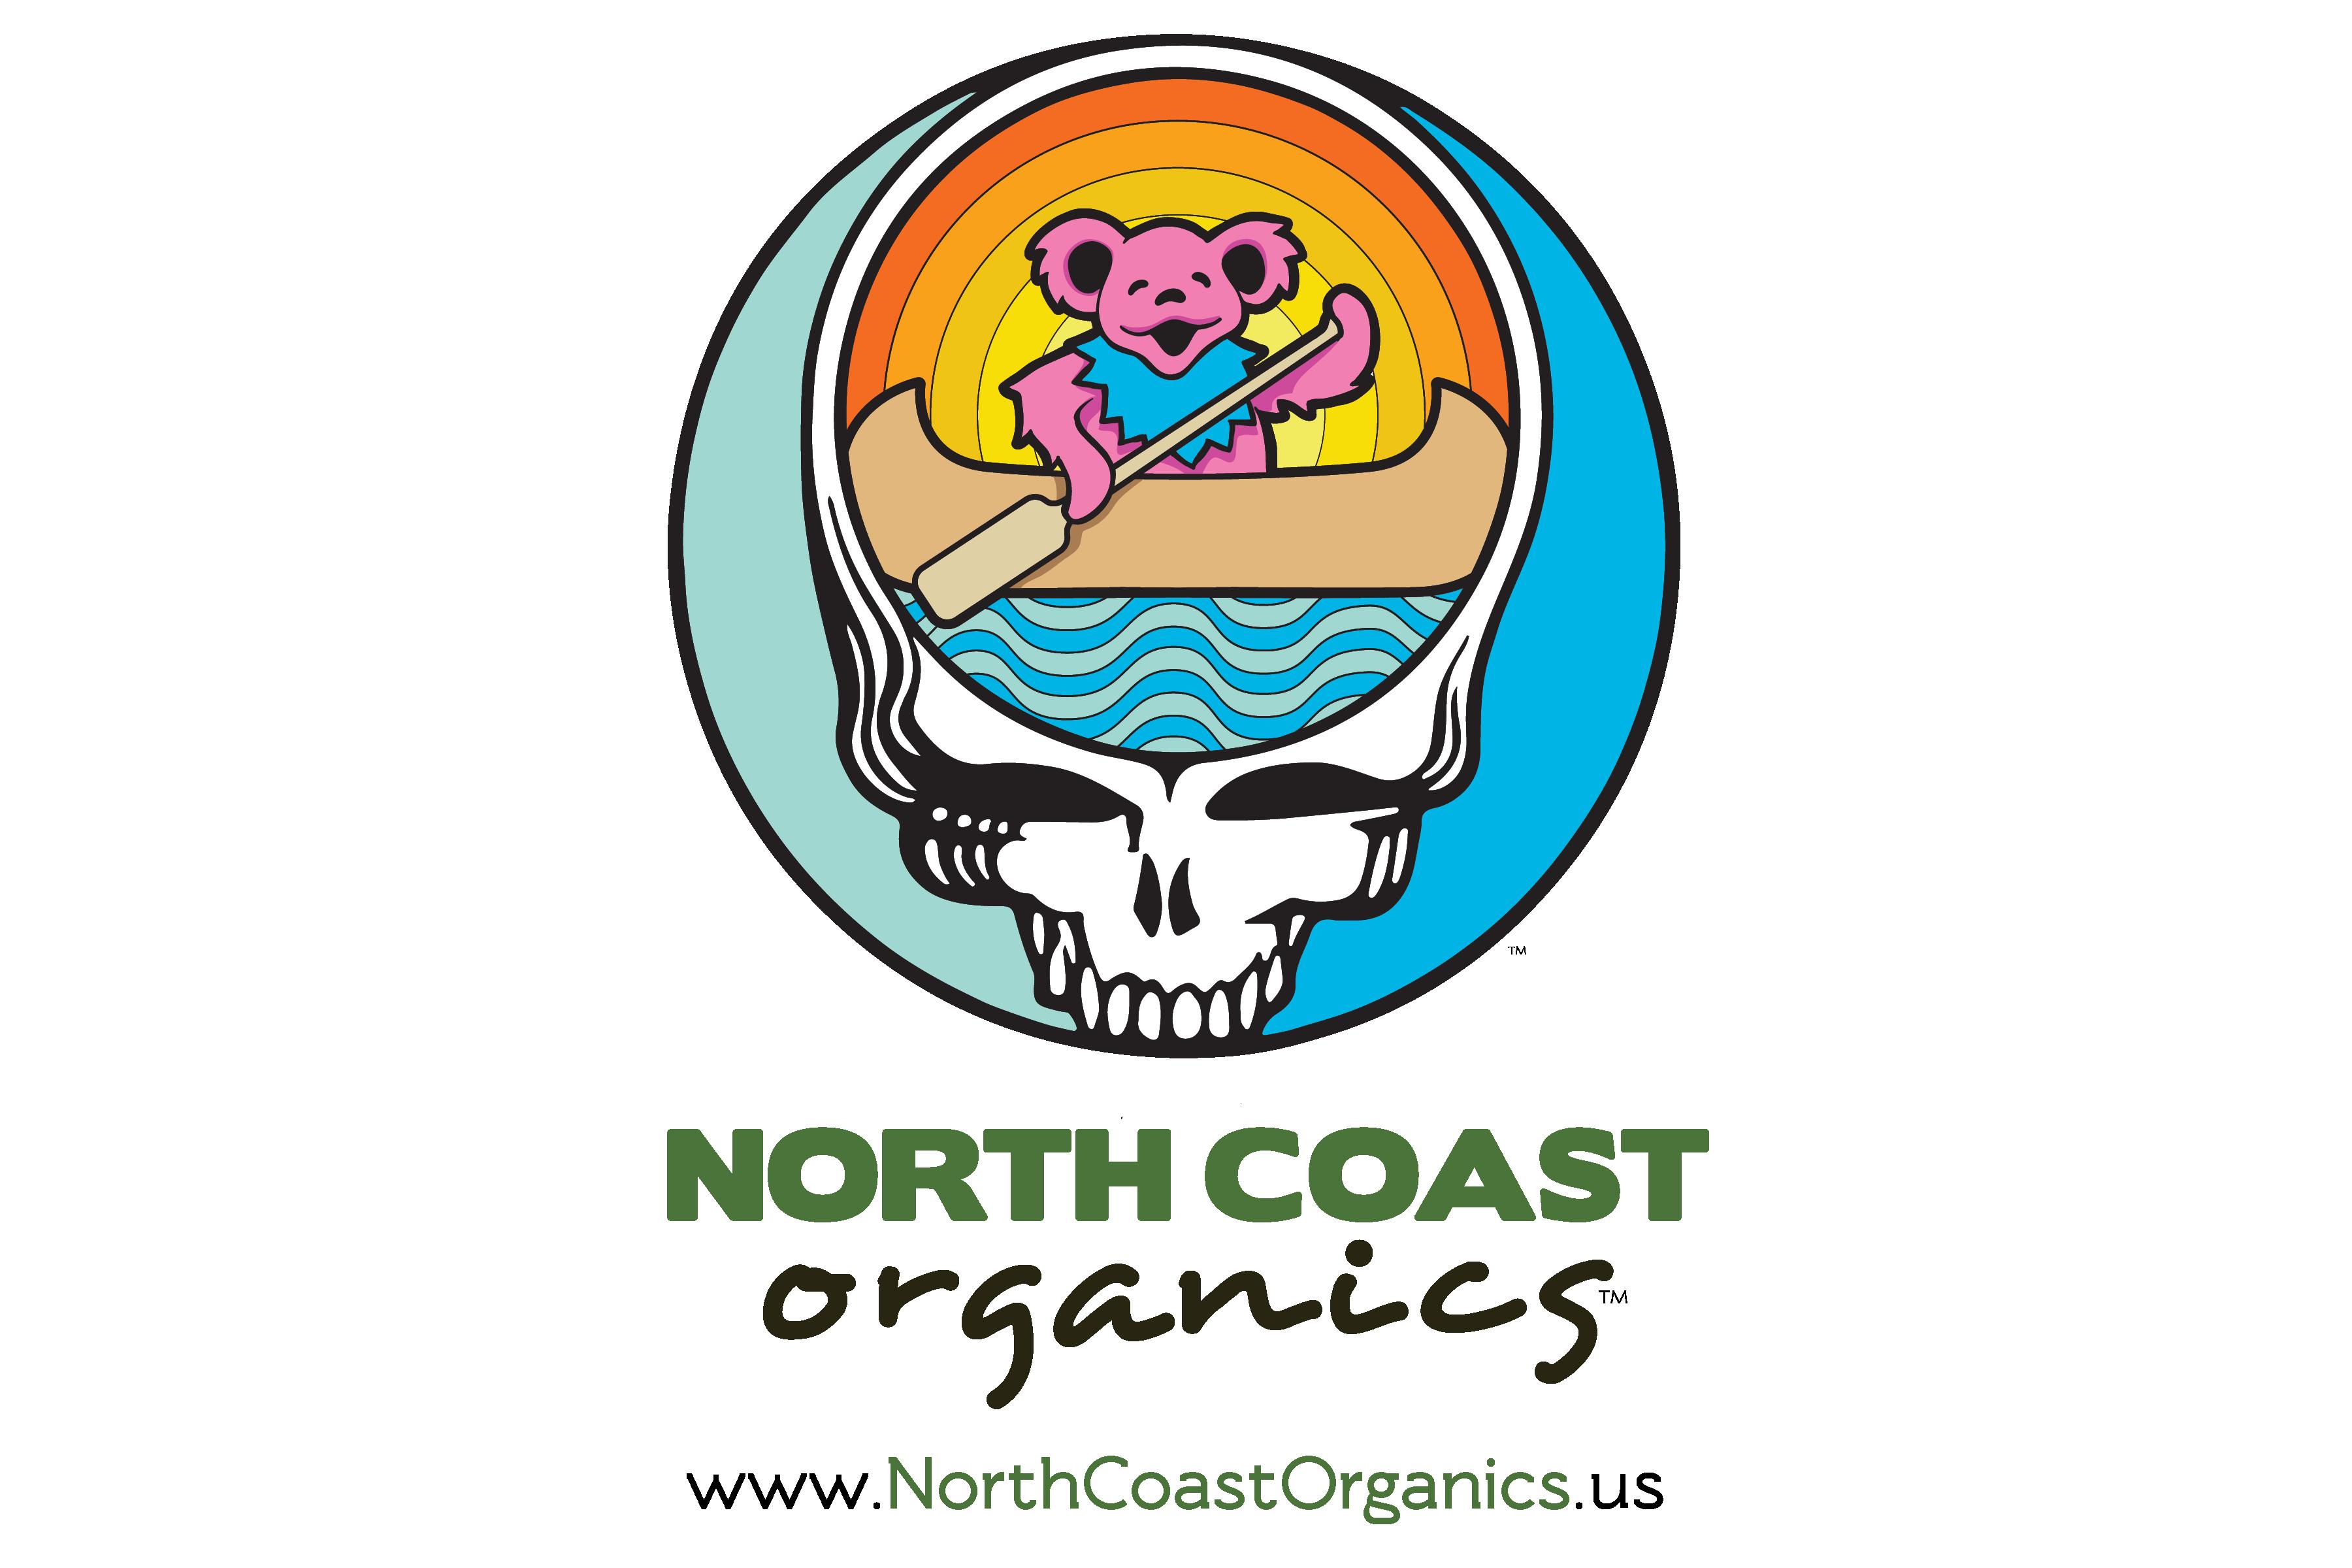 North Coast Organics